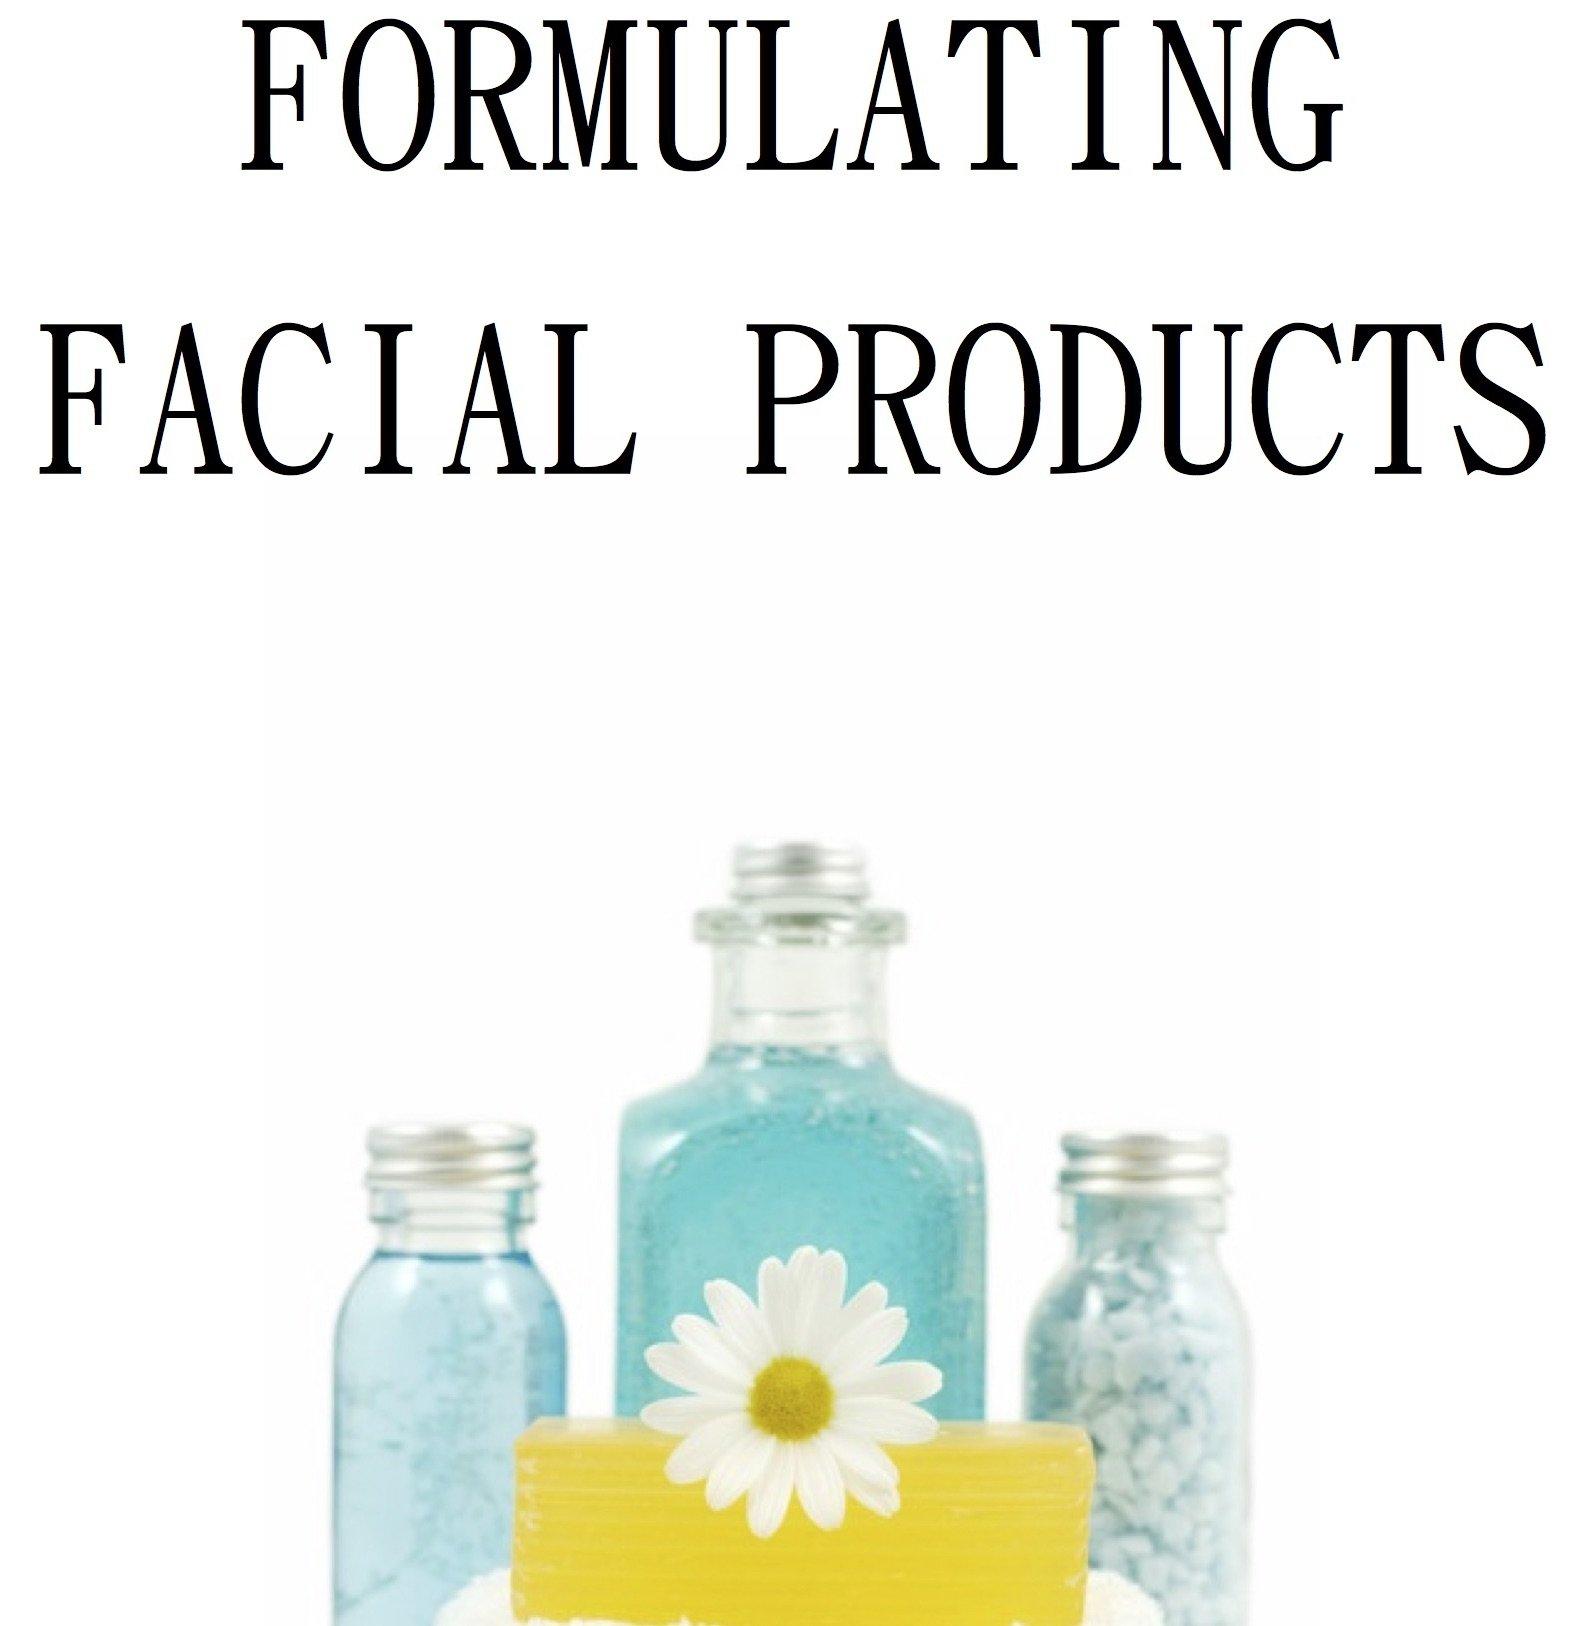 Formulating Facial Products